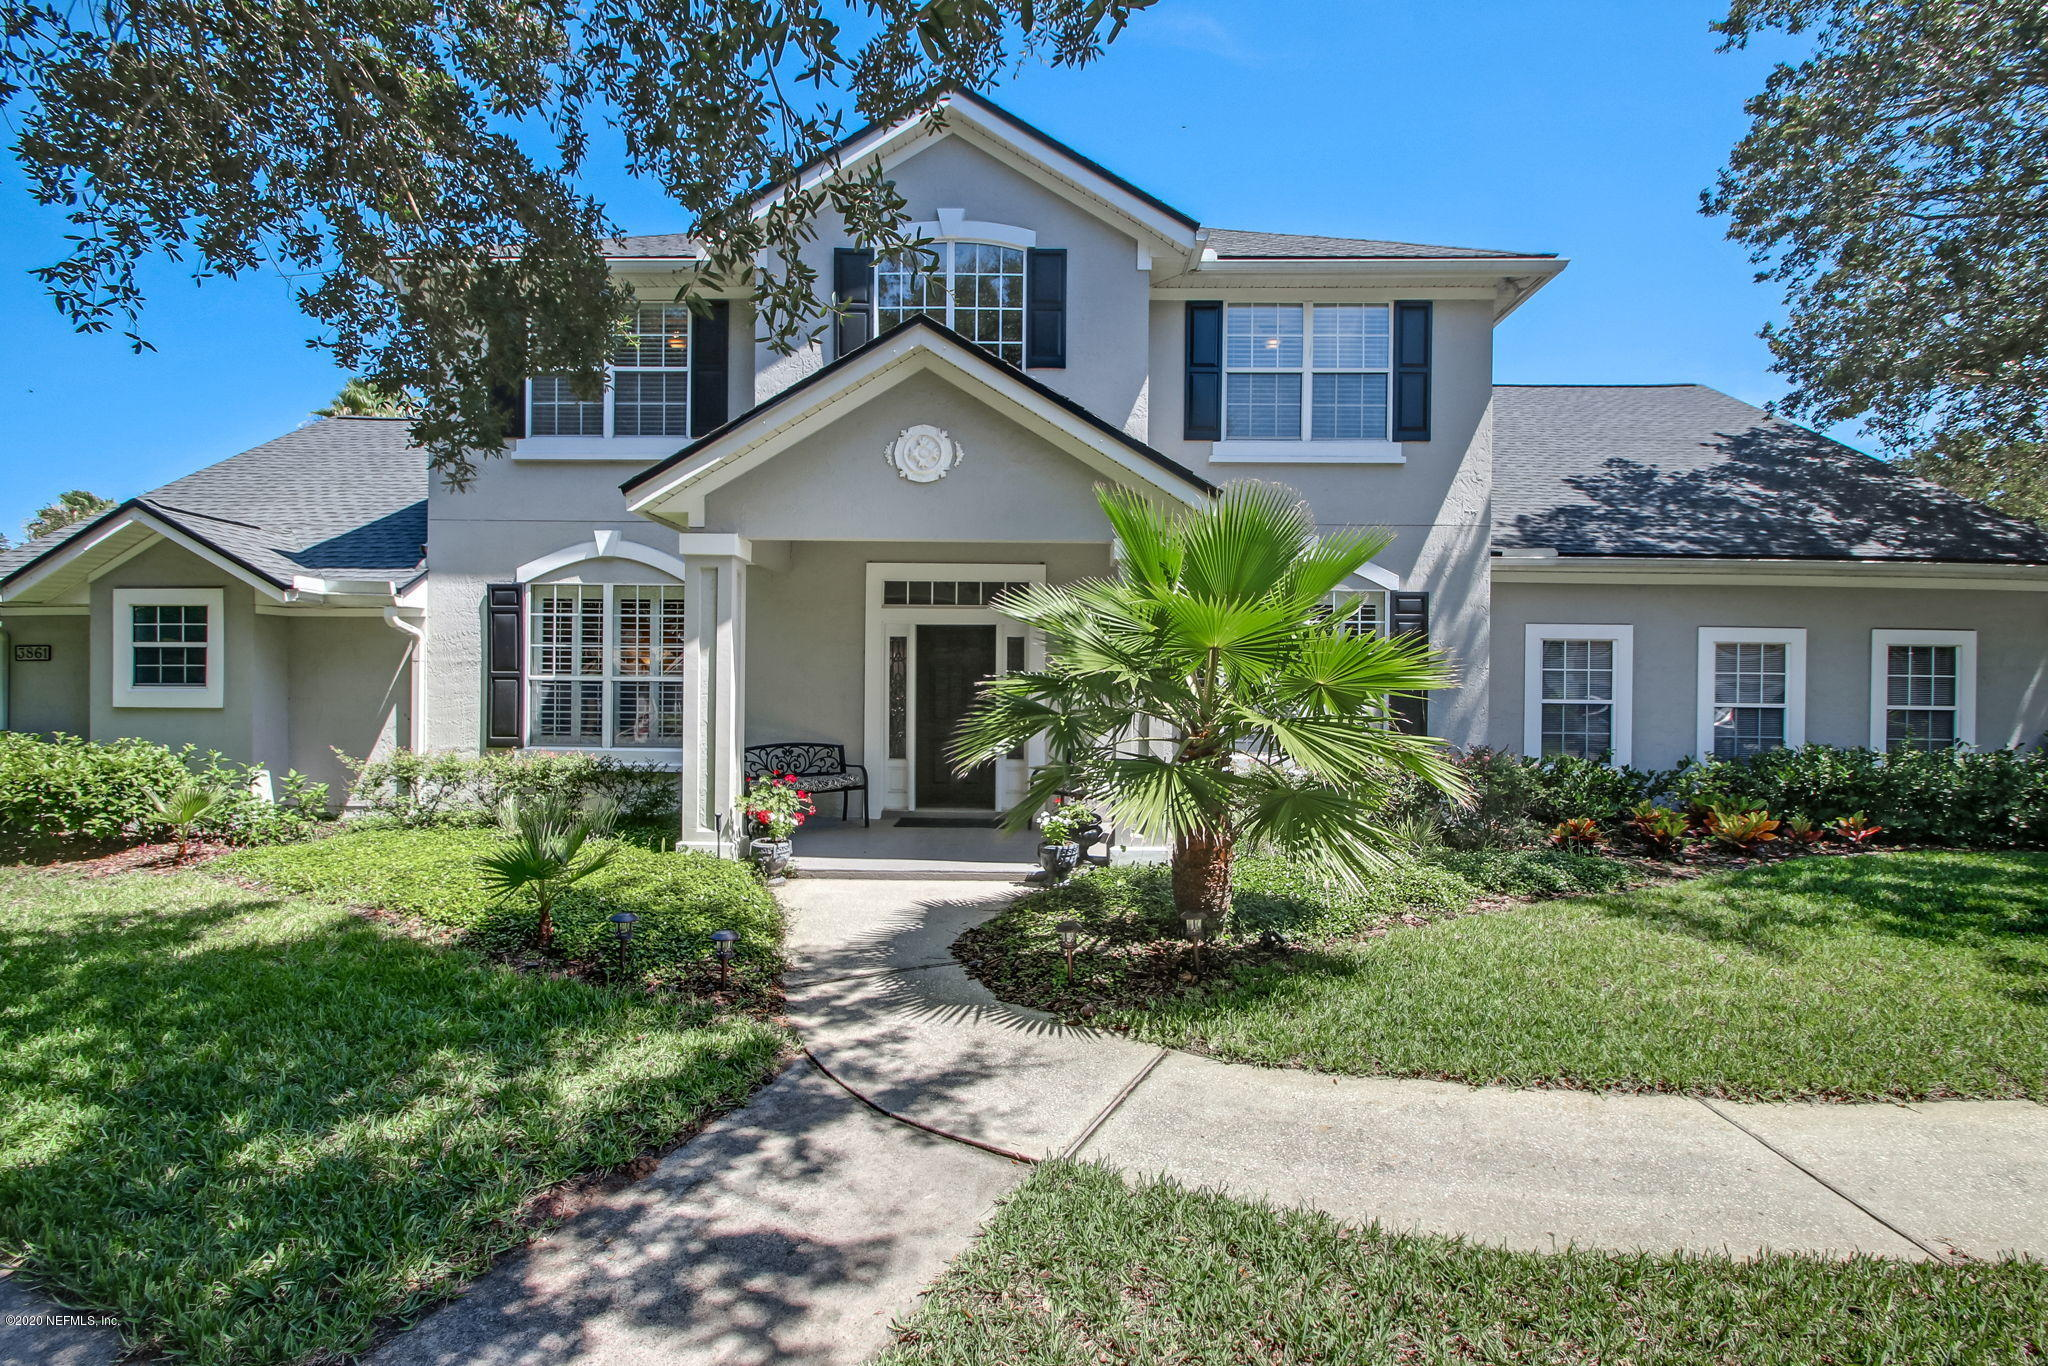 3861 MICHAELS LANDING, JACKSONVILLE, FLORIDA 32224, 5 Bedrooms Bedrooms, ,4 BathroomsBathrooms,Residential,For sale,MICHAELS LANDING,1061445